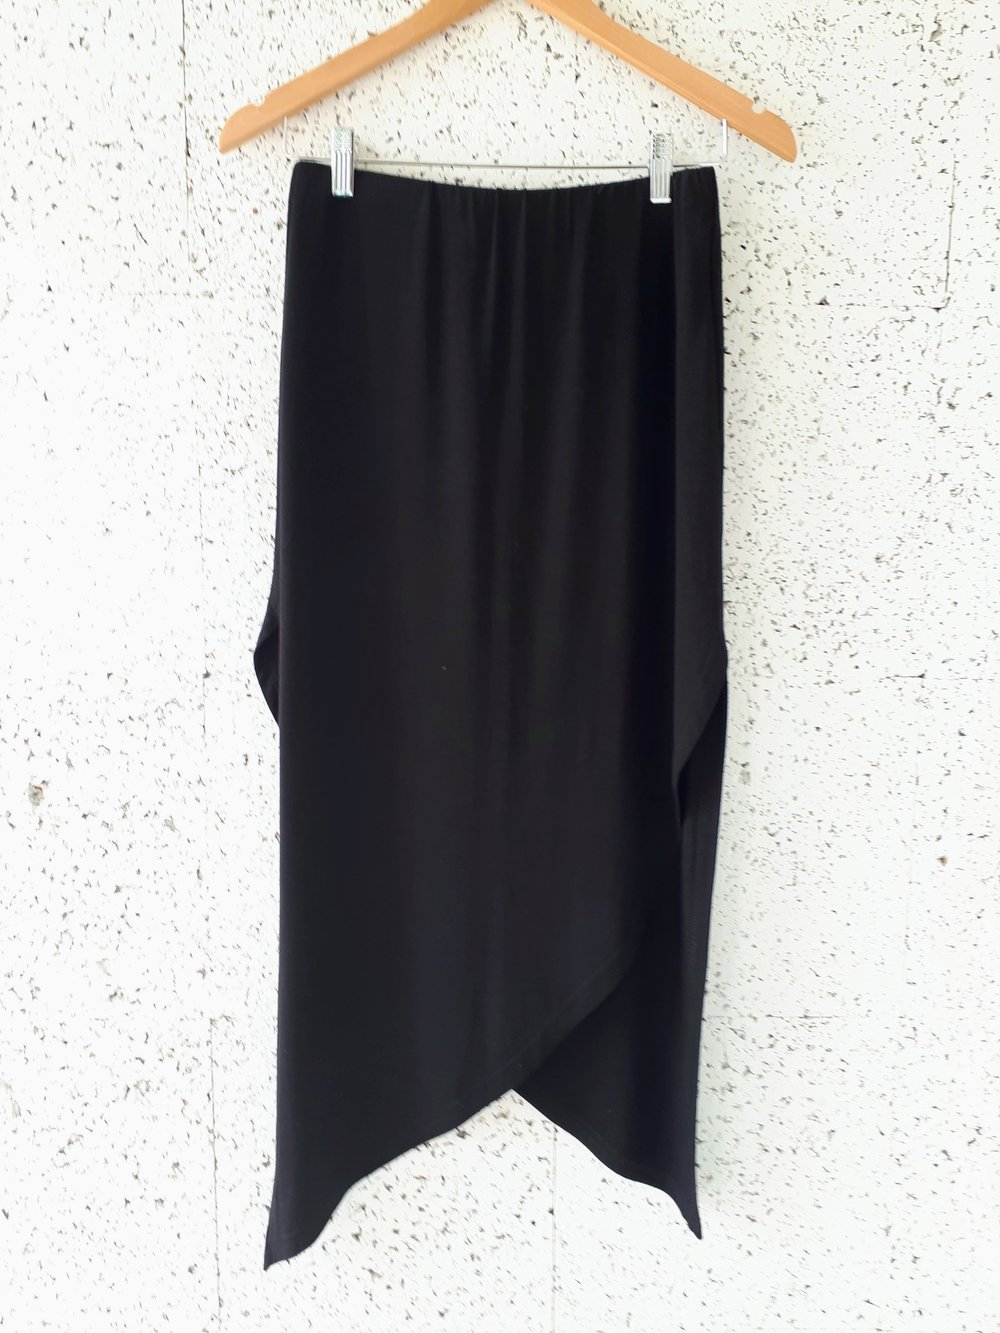 Loft 82 skirt; Size S, $38